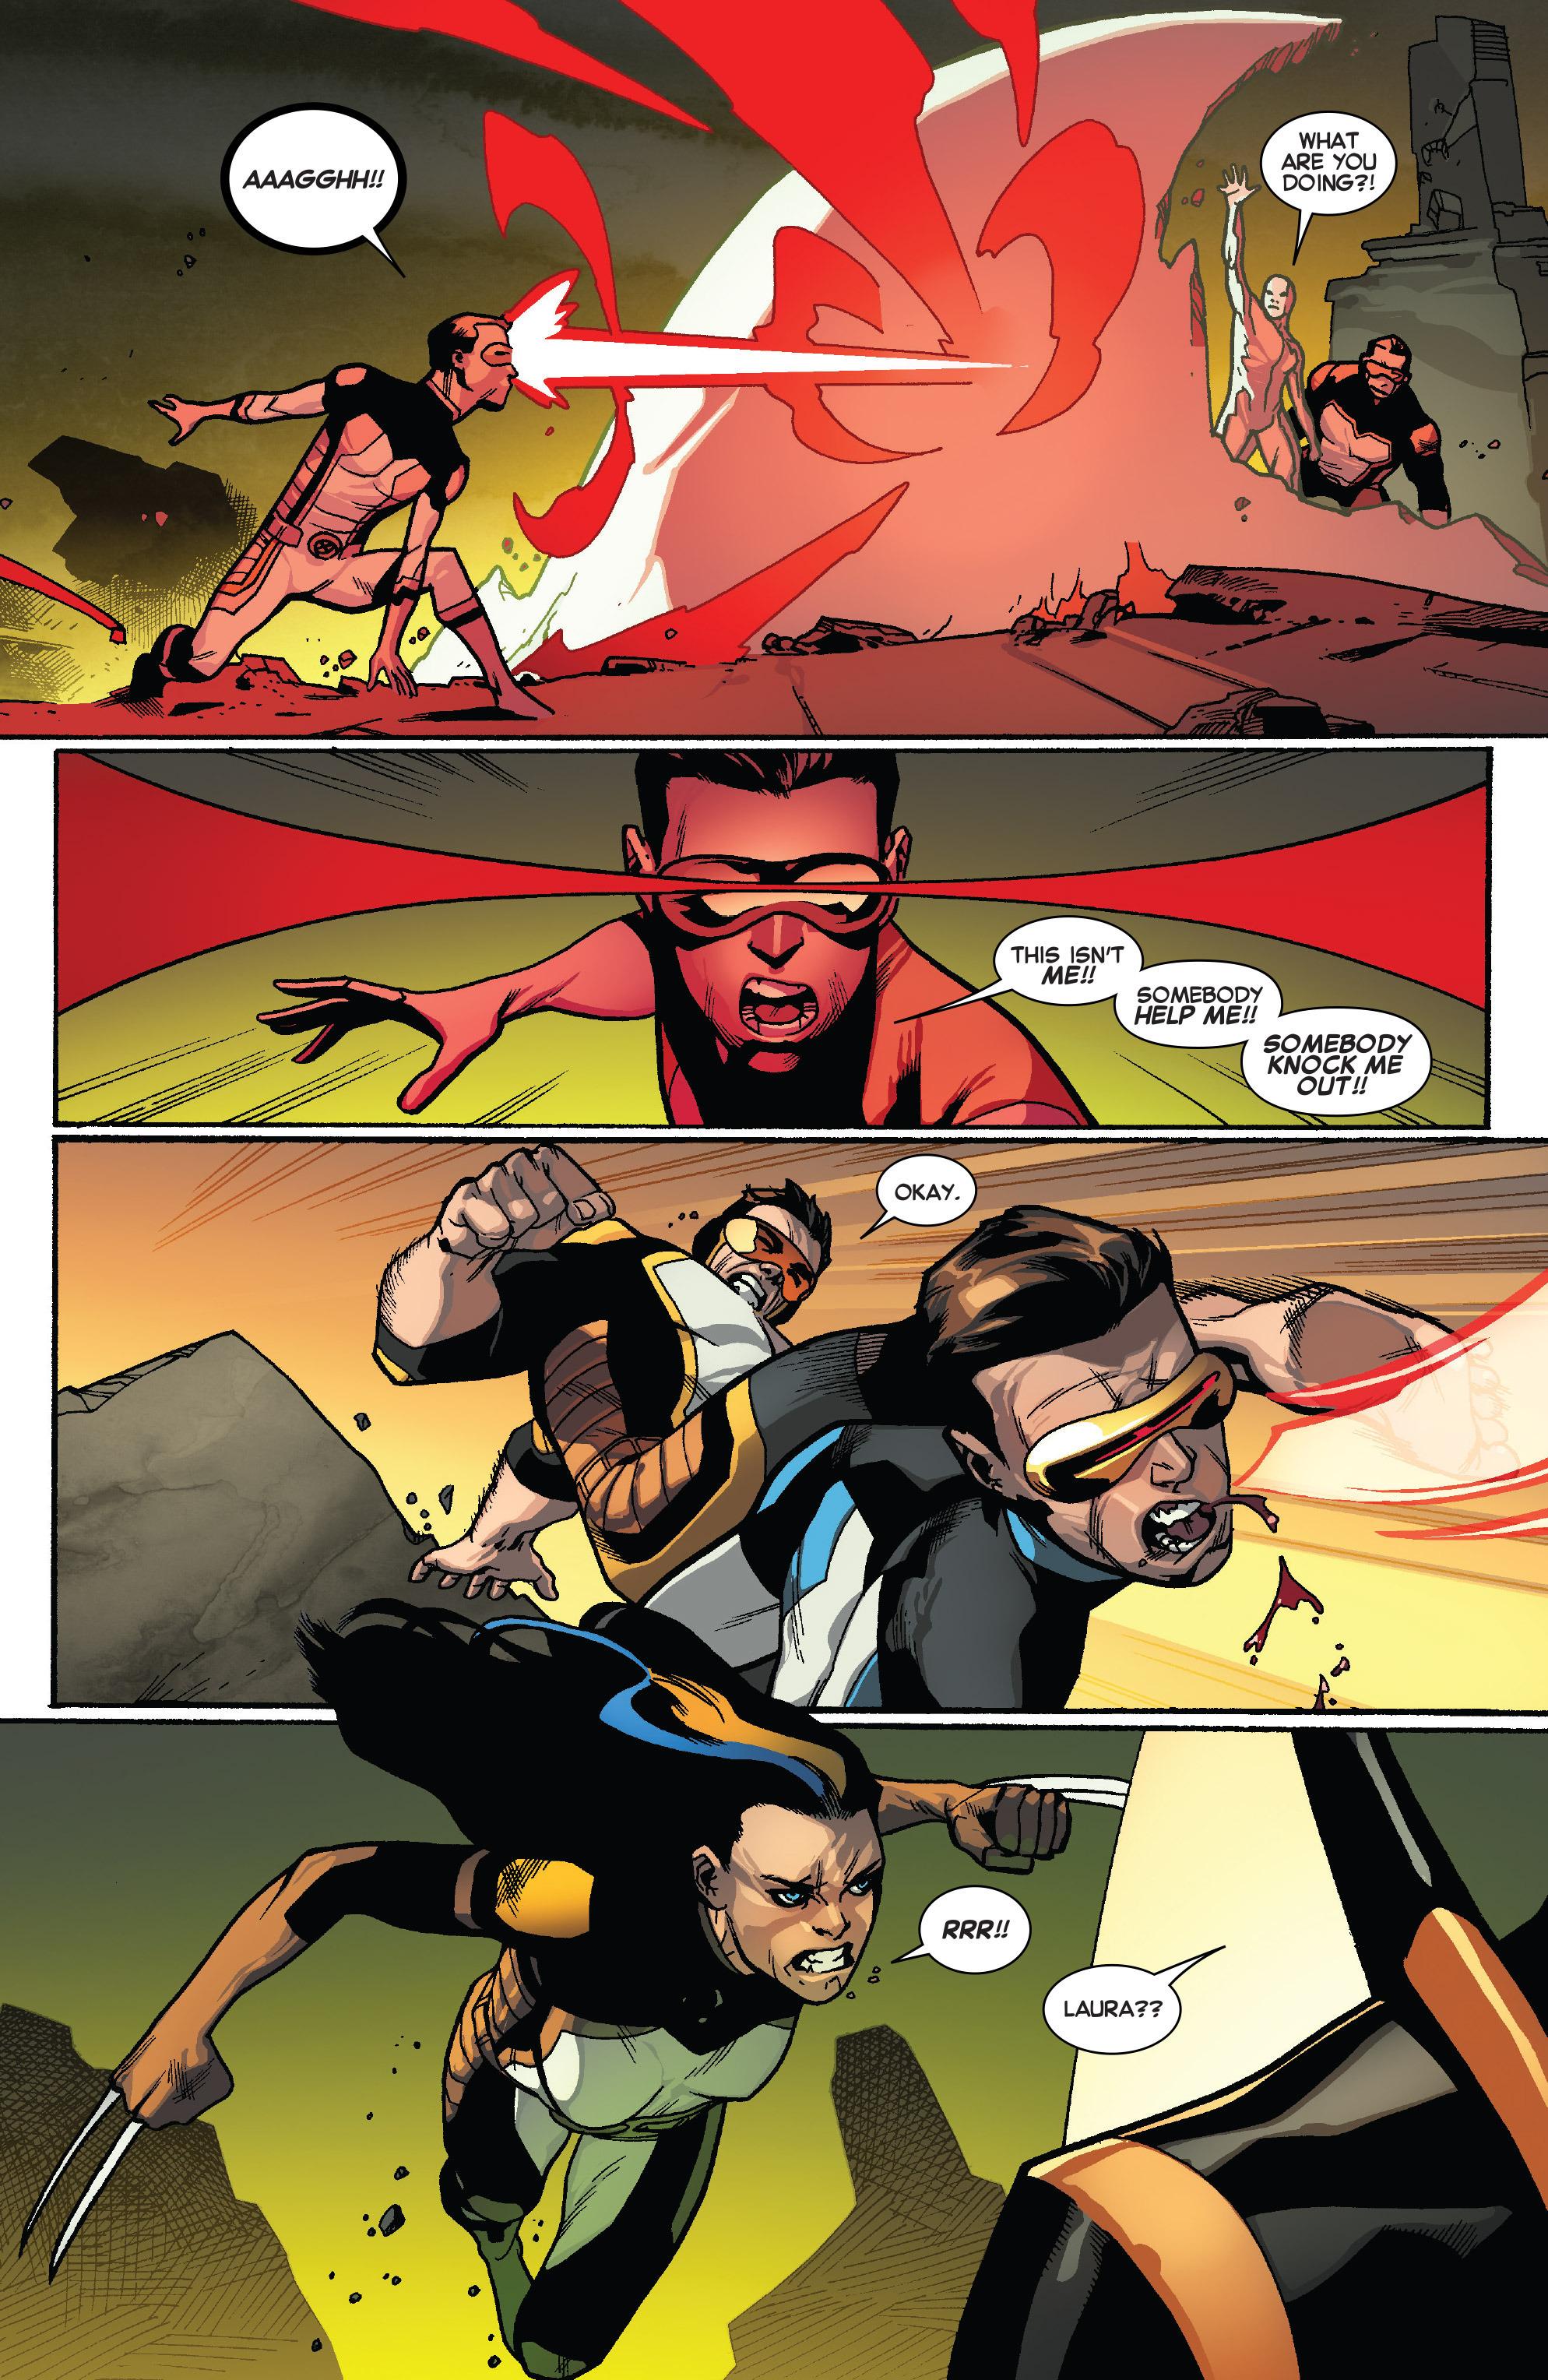 All-New X-Men (2013) chap 41 pic 11